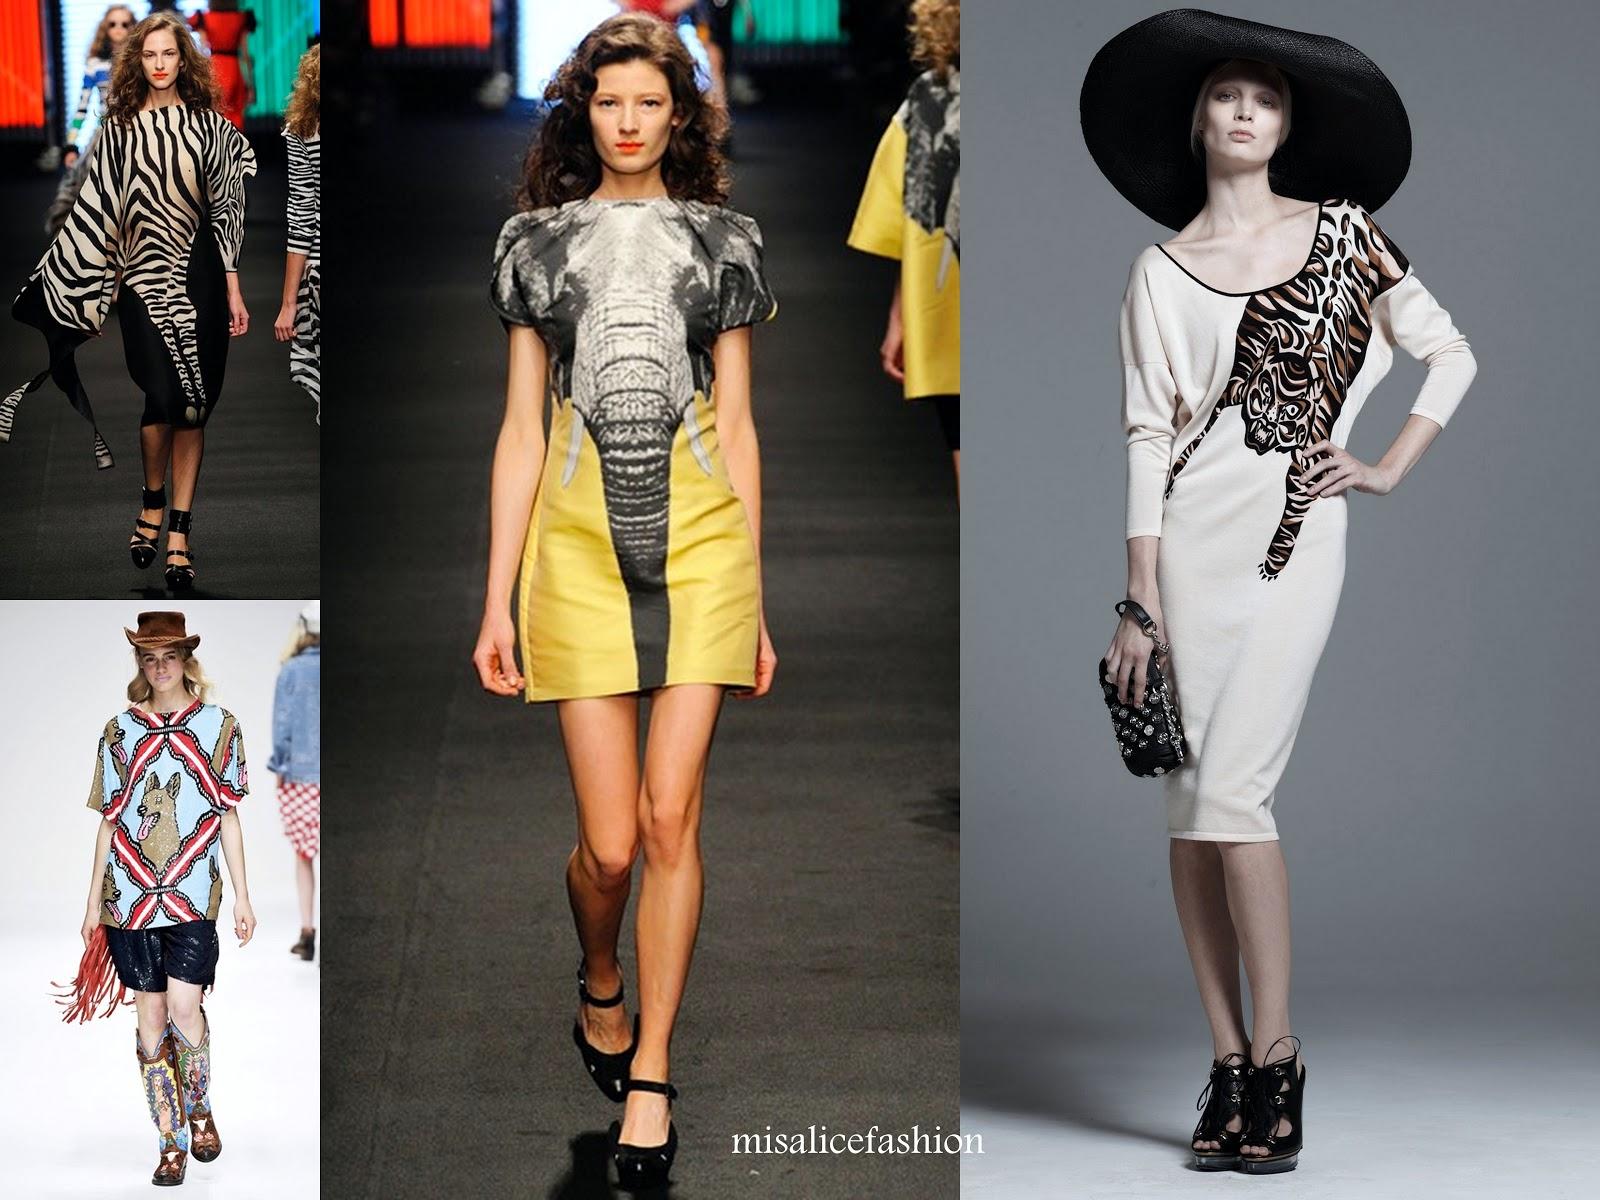 Yeni sezon mayo modelleri 2012 – 2013